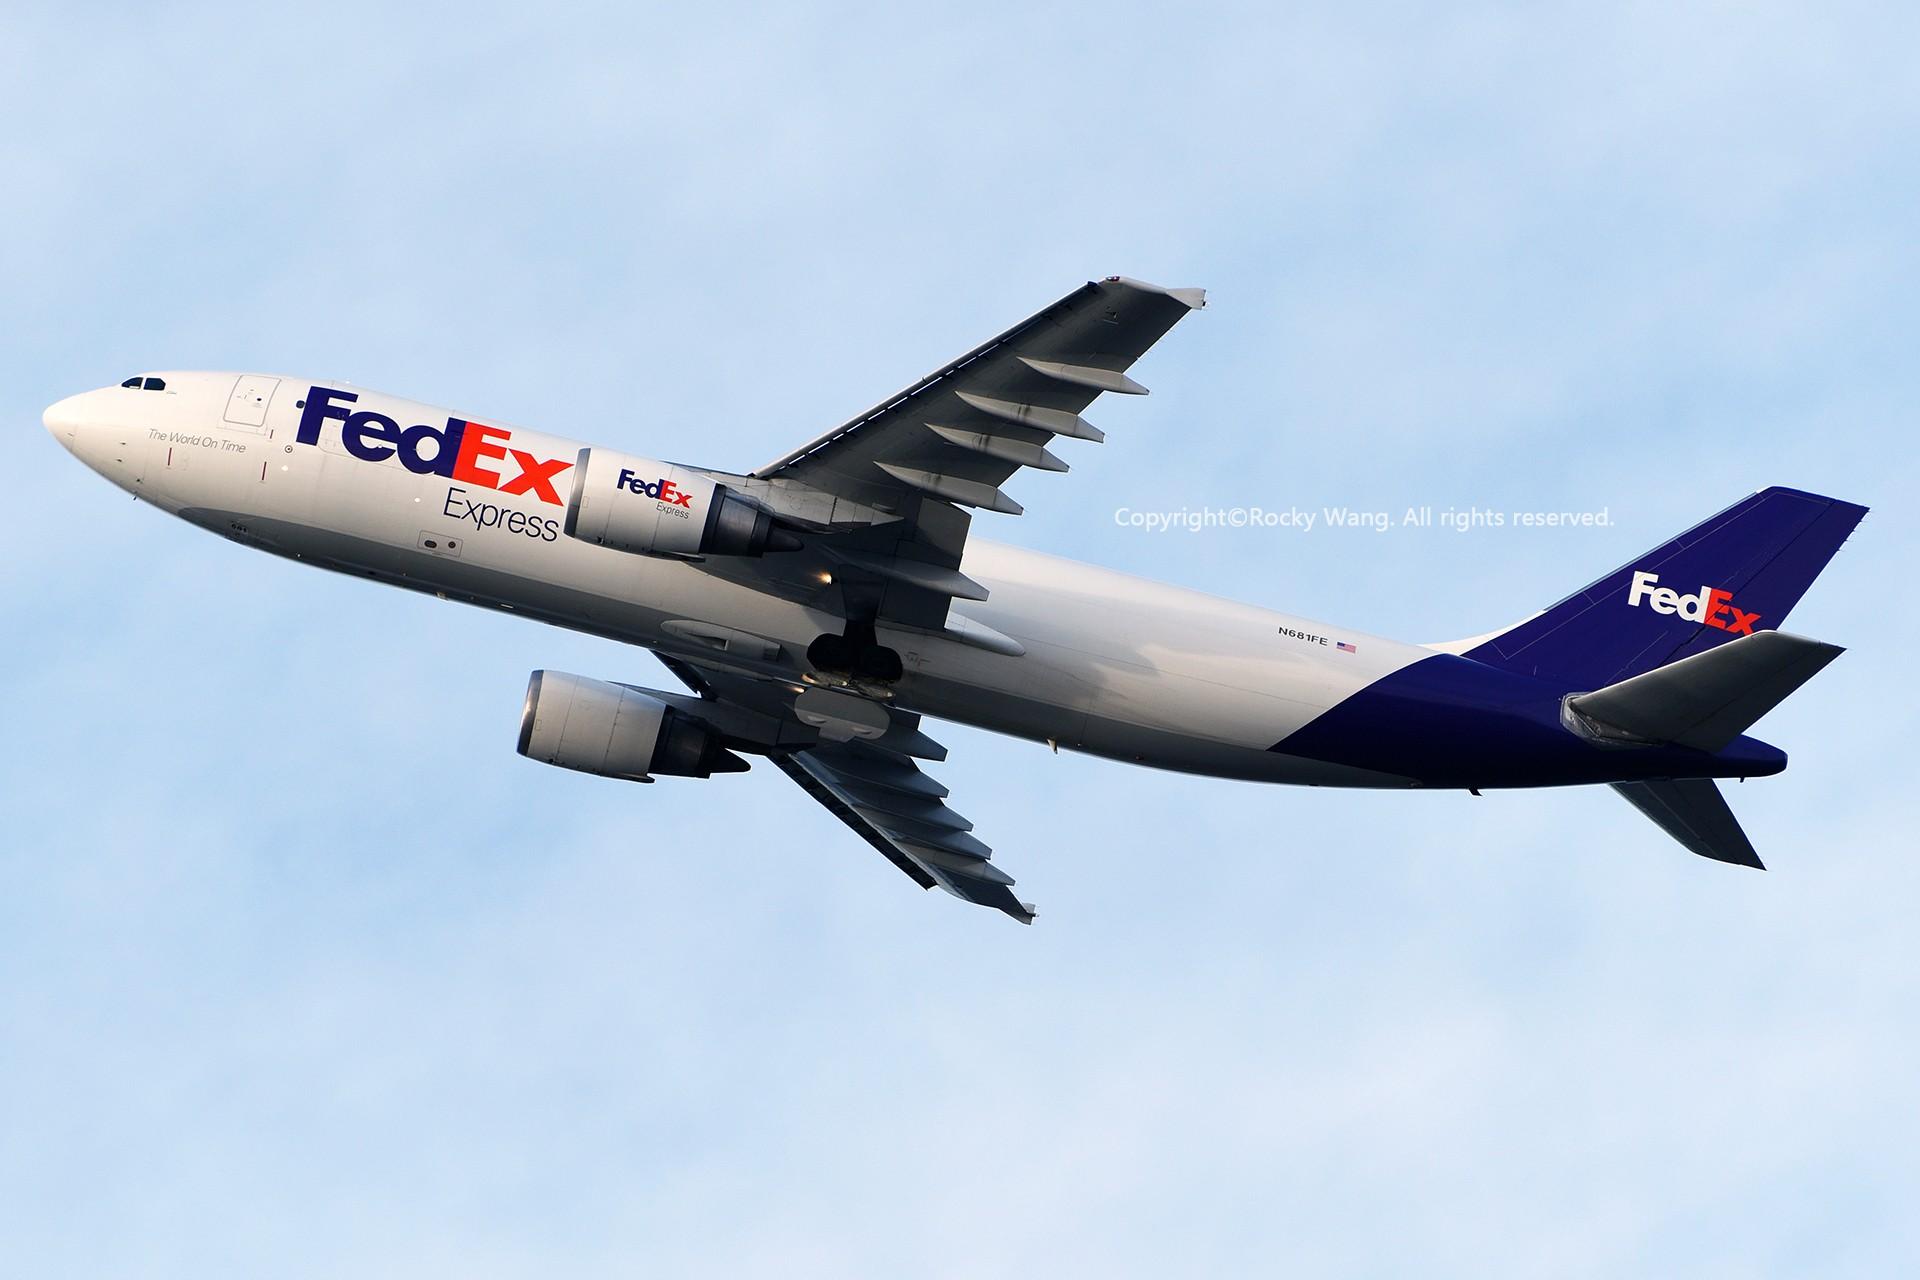 Re:[原创]Seattle 30图 AIRBUS A300F4-605R N681FE Seattle-Tacoma Int'l Airport